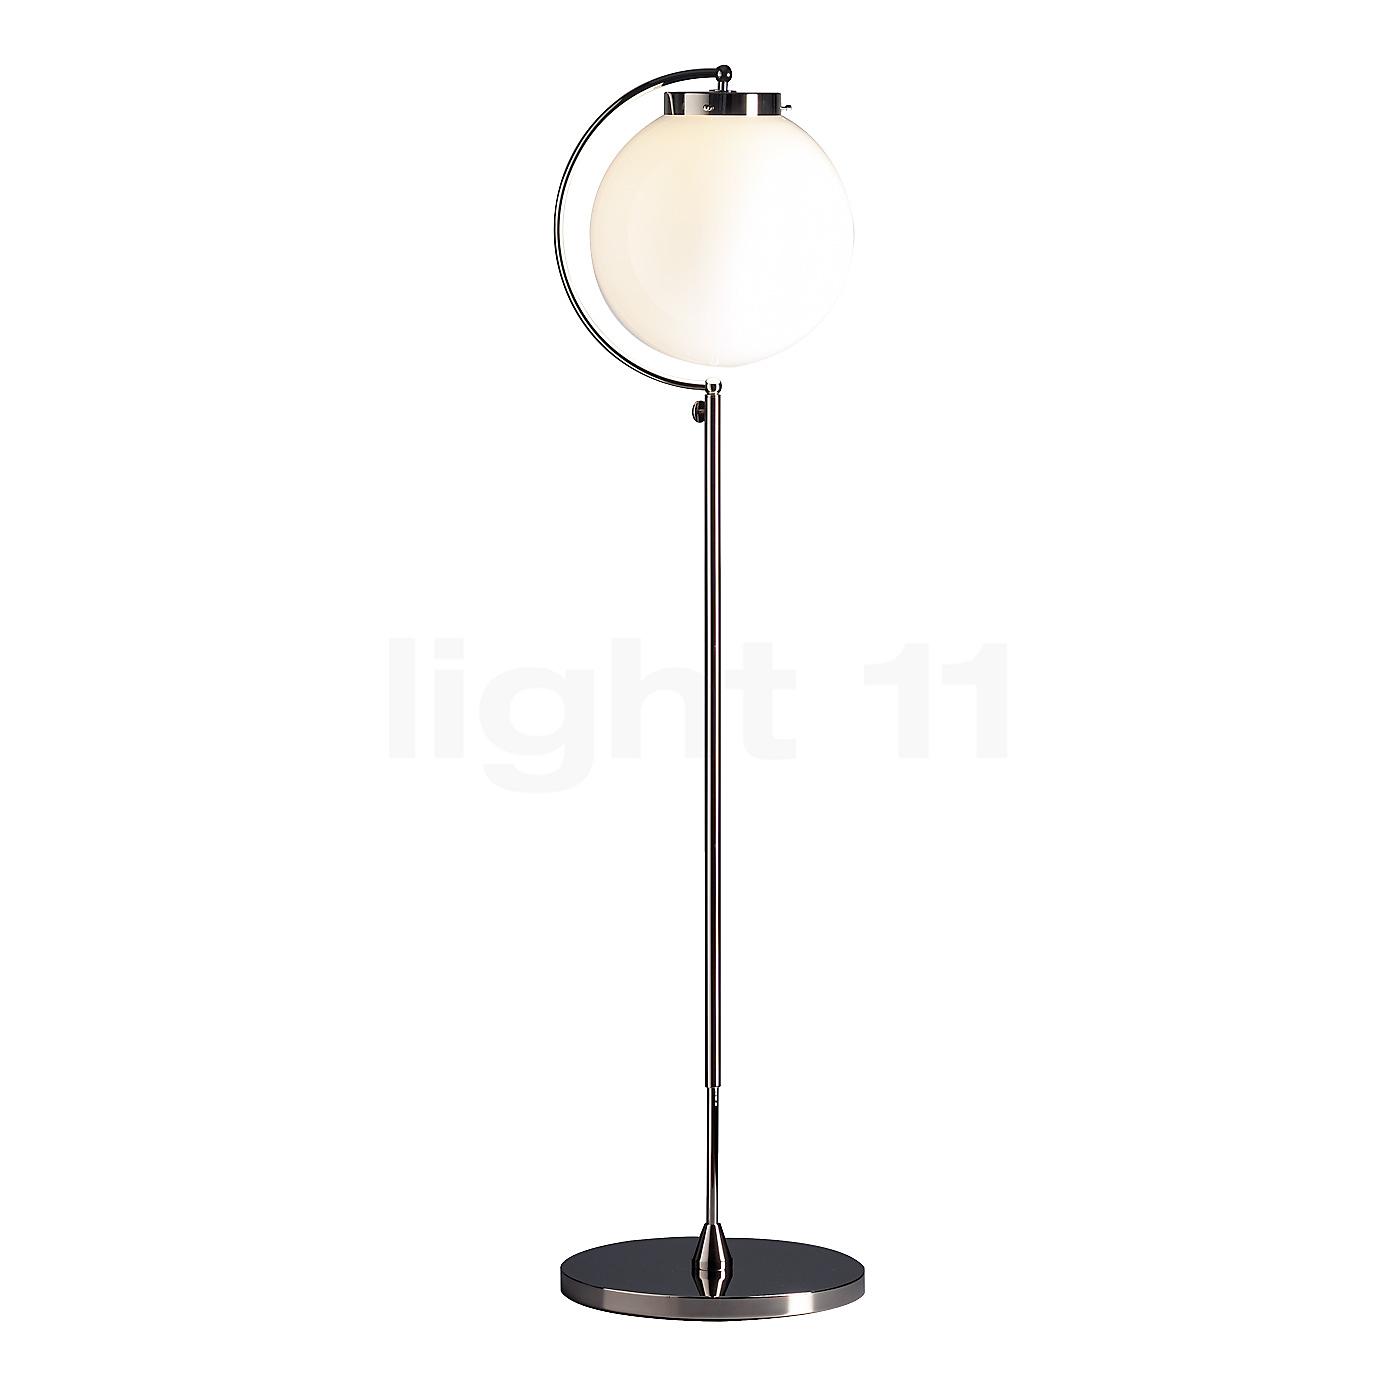 bauhaus dsl 23 floor lamp floor lamps lamps lights. Black Bedroom Furniture Sets. Home Design Ideas